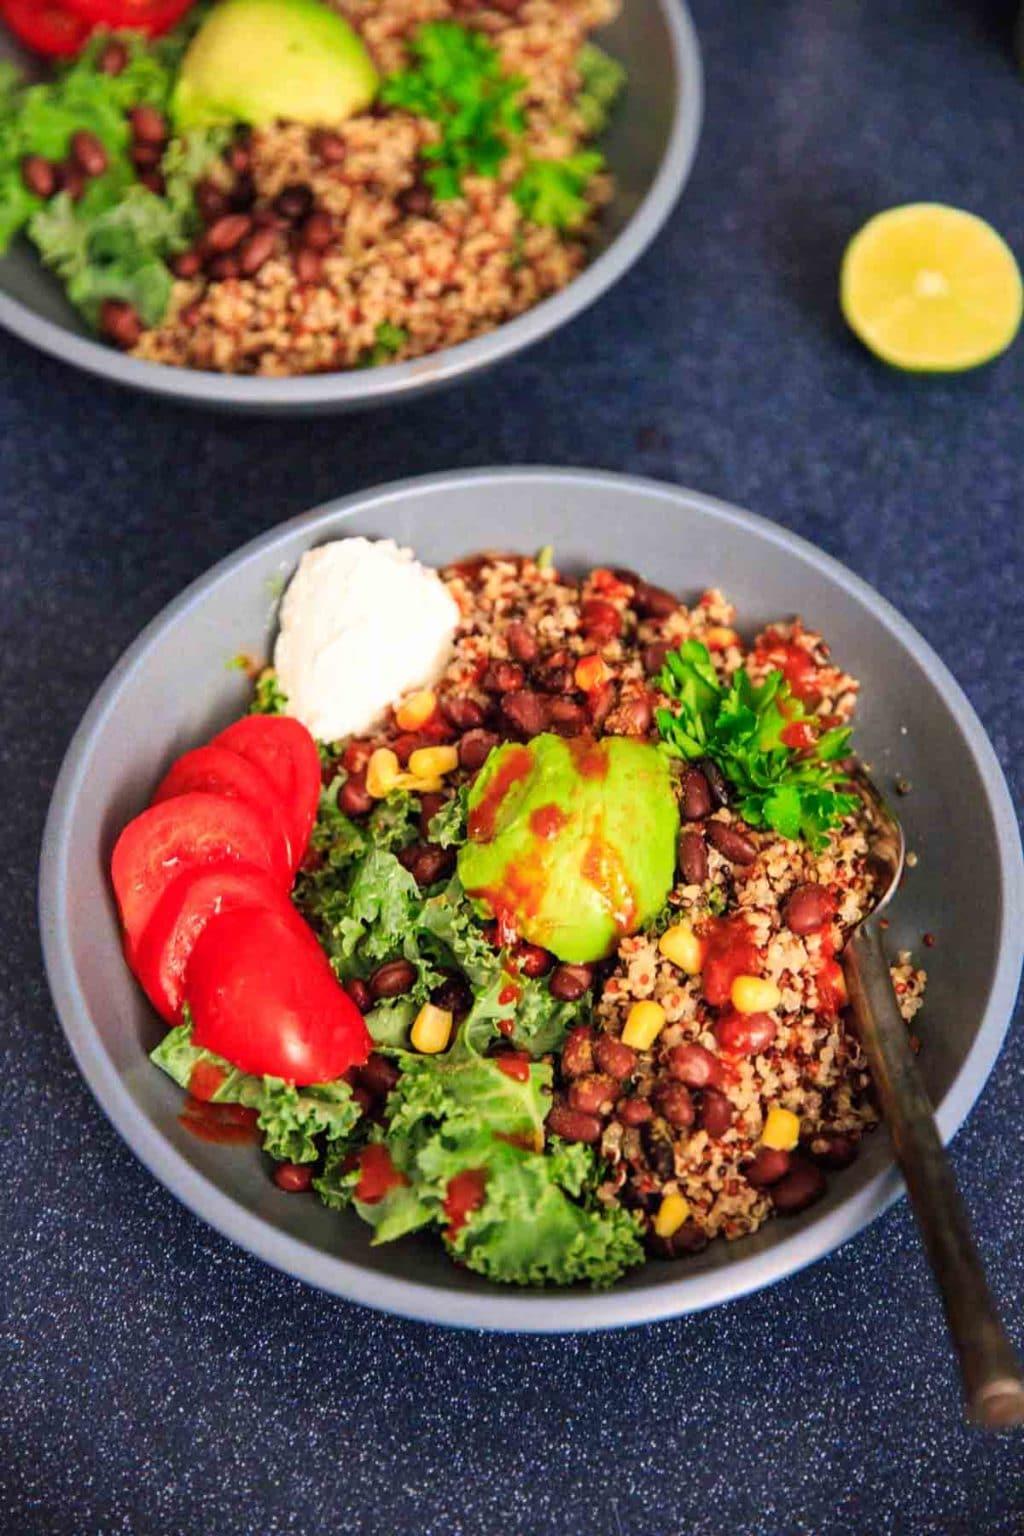 A customizable vegan and gluten-free buddha bowl with kale, quinoa, tomato, avocado, black beans, corn, and more!